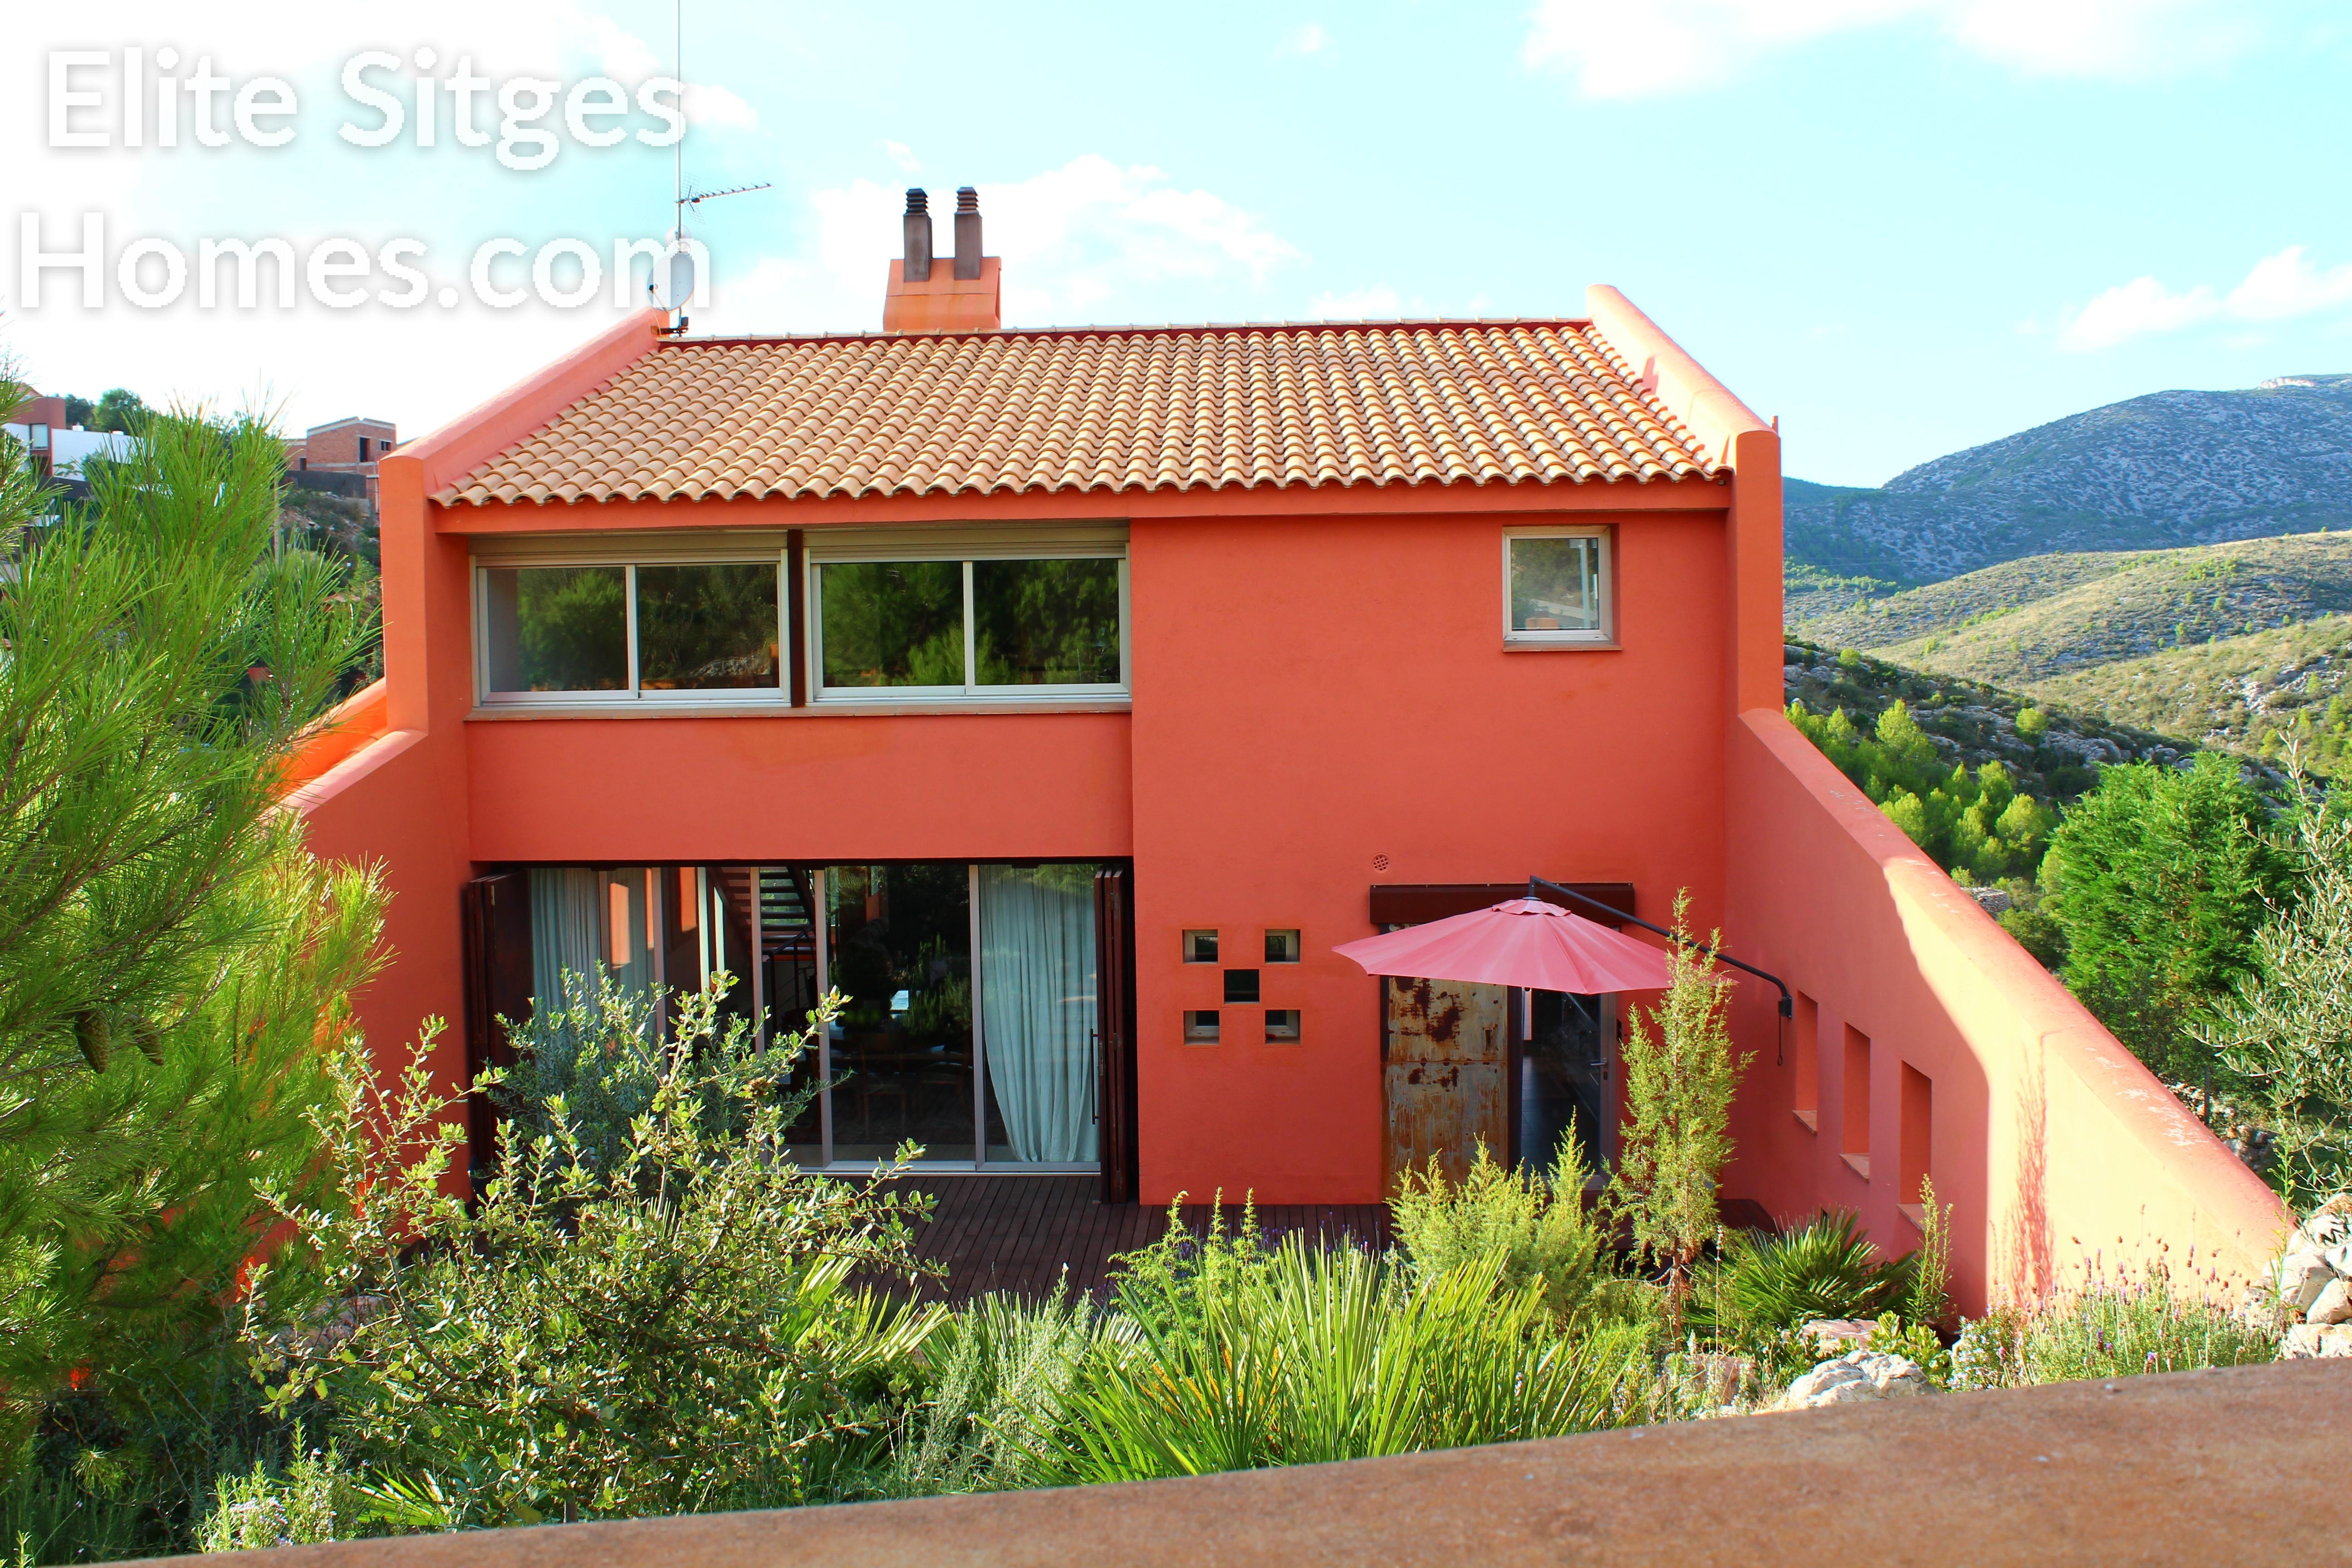 Plana novella cerca de sitges impresionante villa en venta for Novella homes